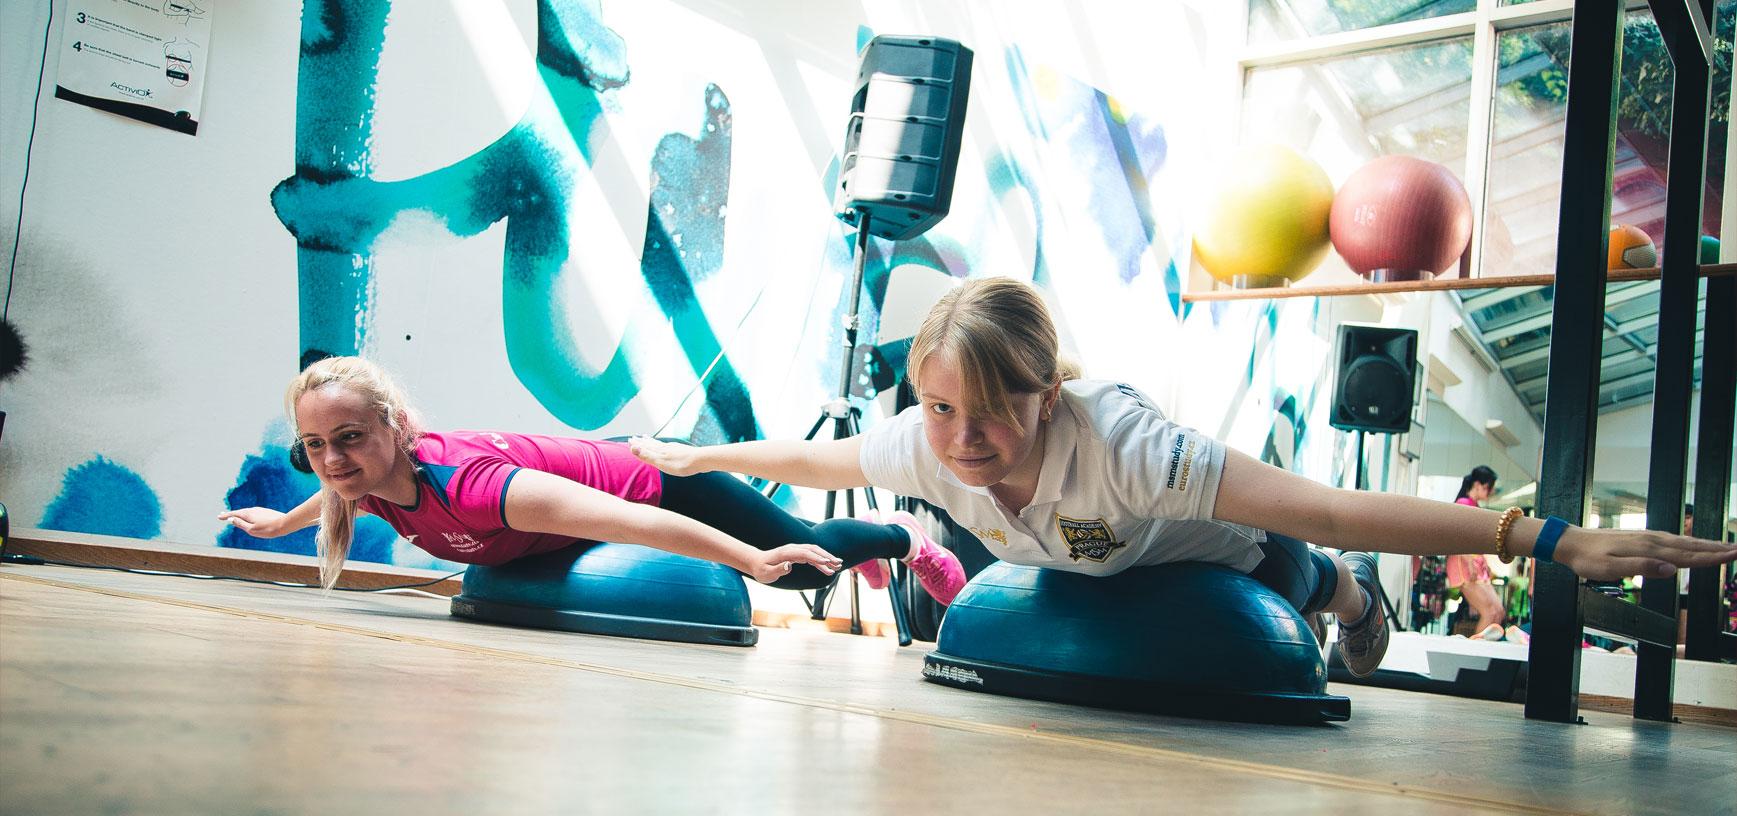 Летний курс по фитнесу Fitness Health Academy msmstudy